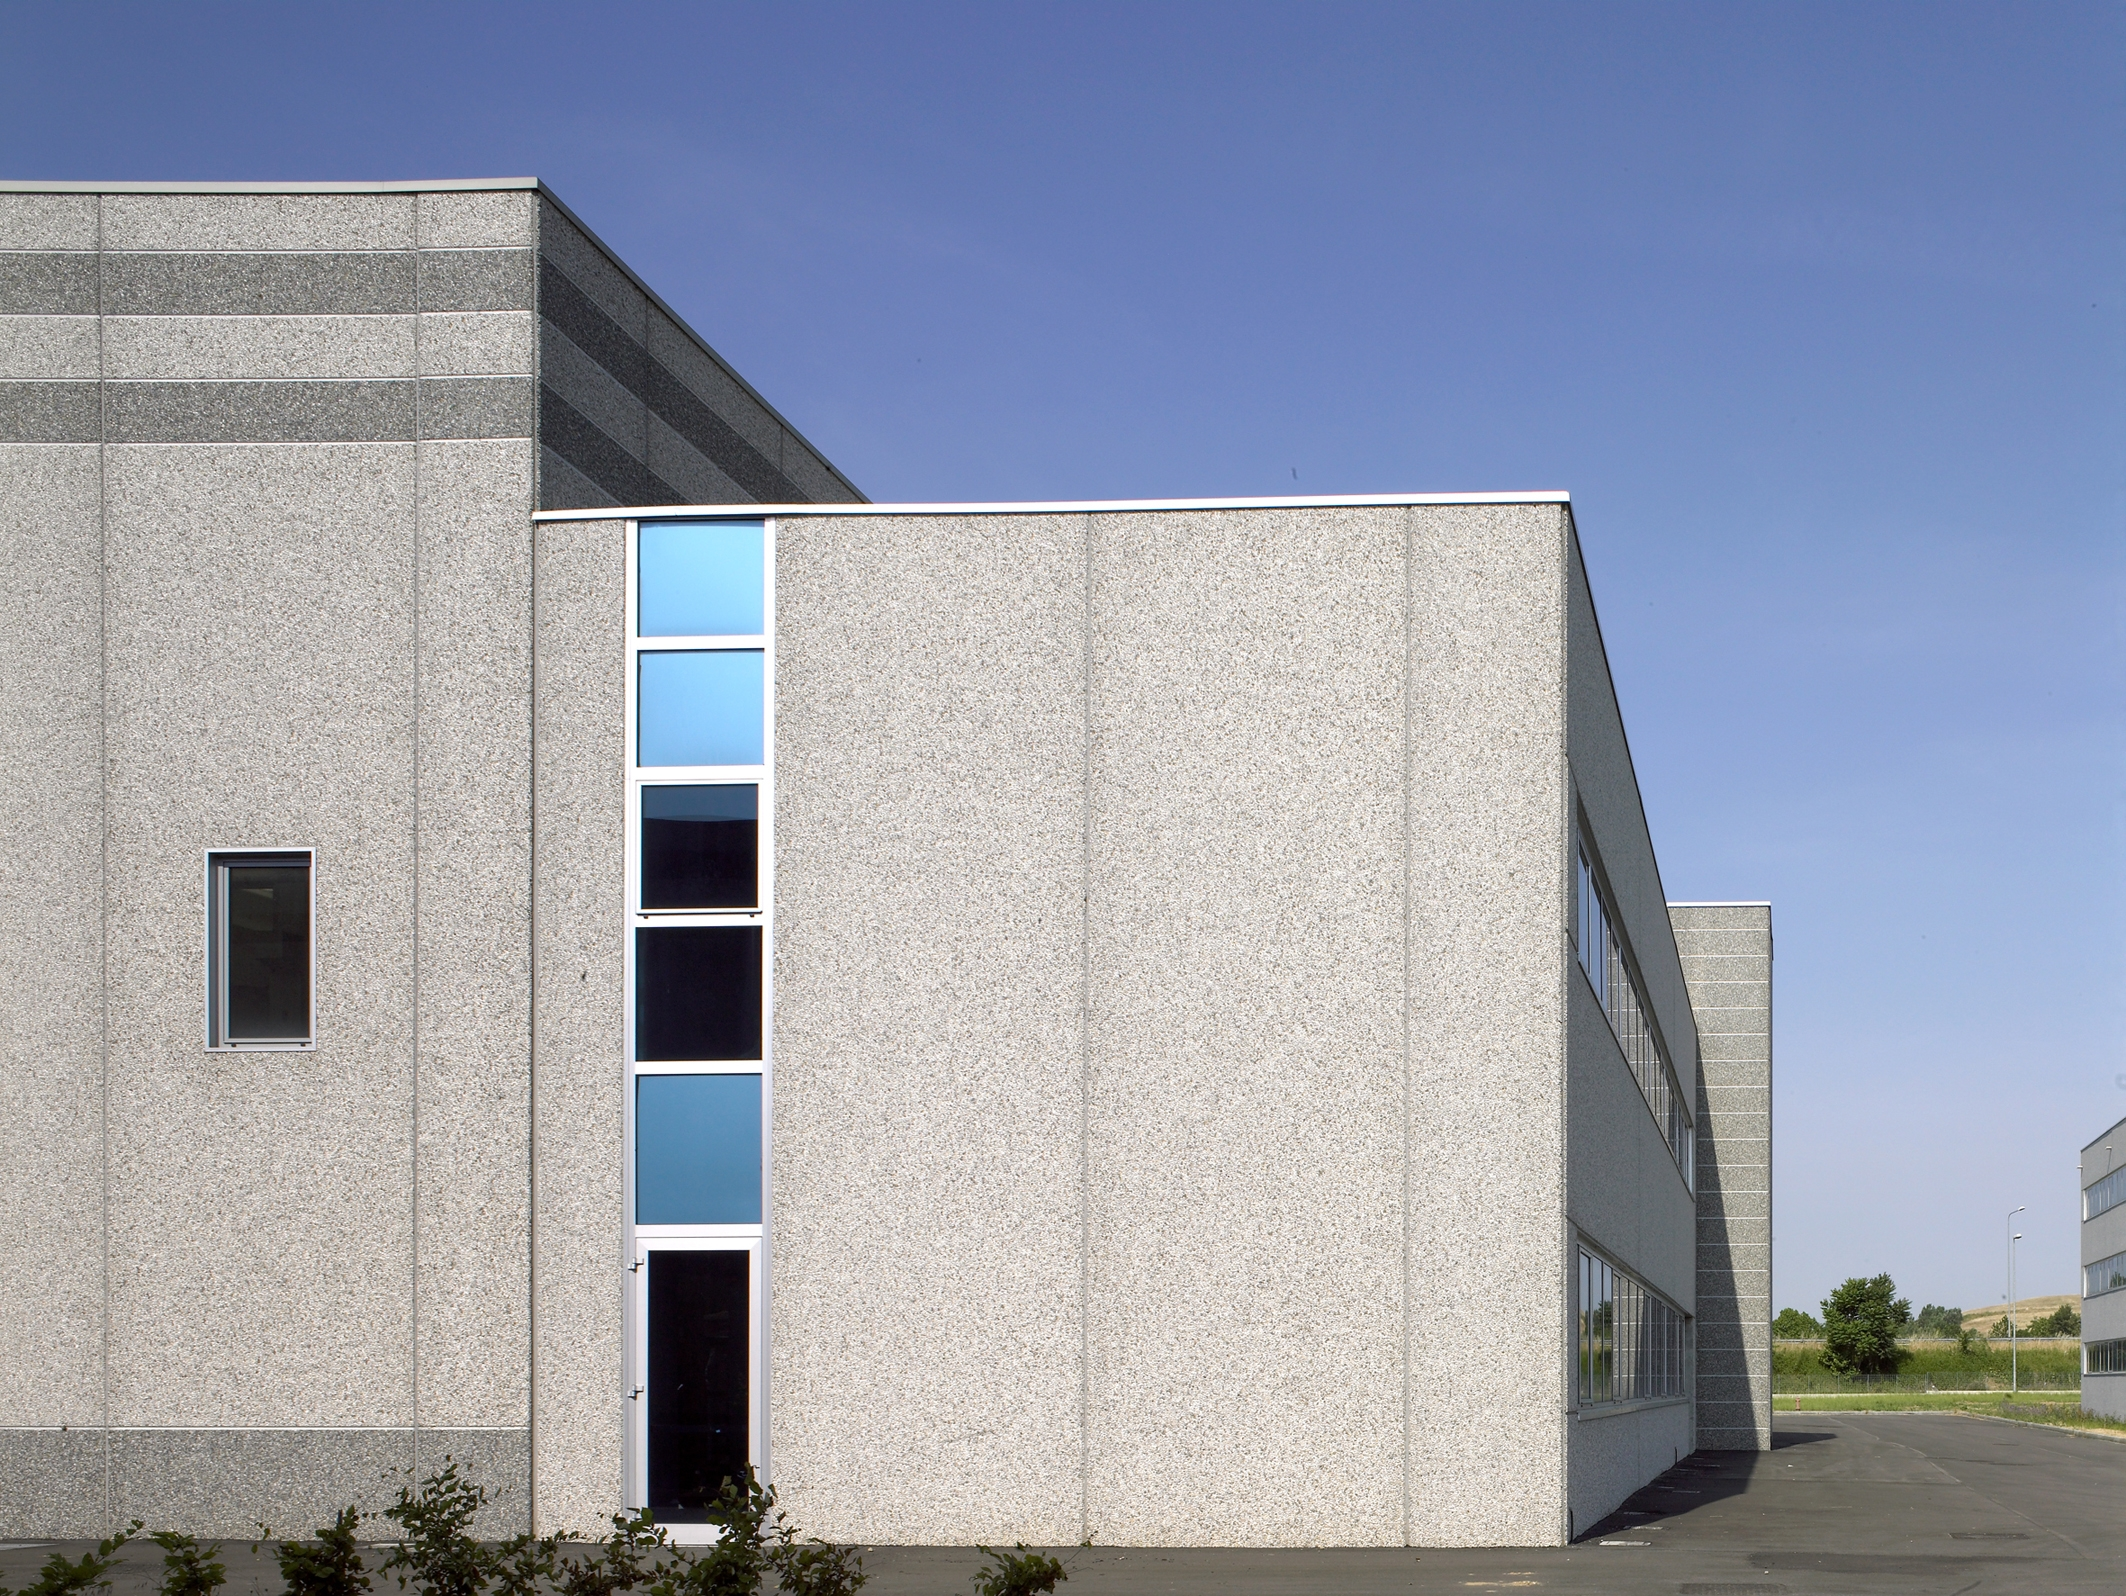 Hale industriale cu elemente structurale prefabricate din beton armat MAGNETTI - Poza 1